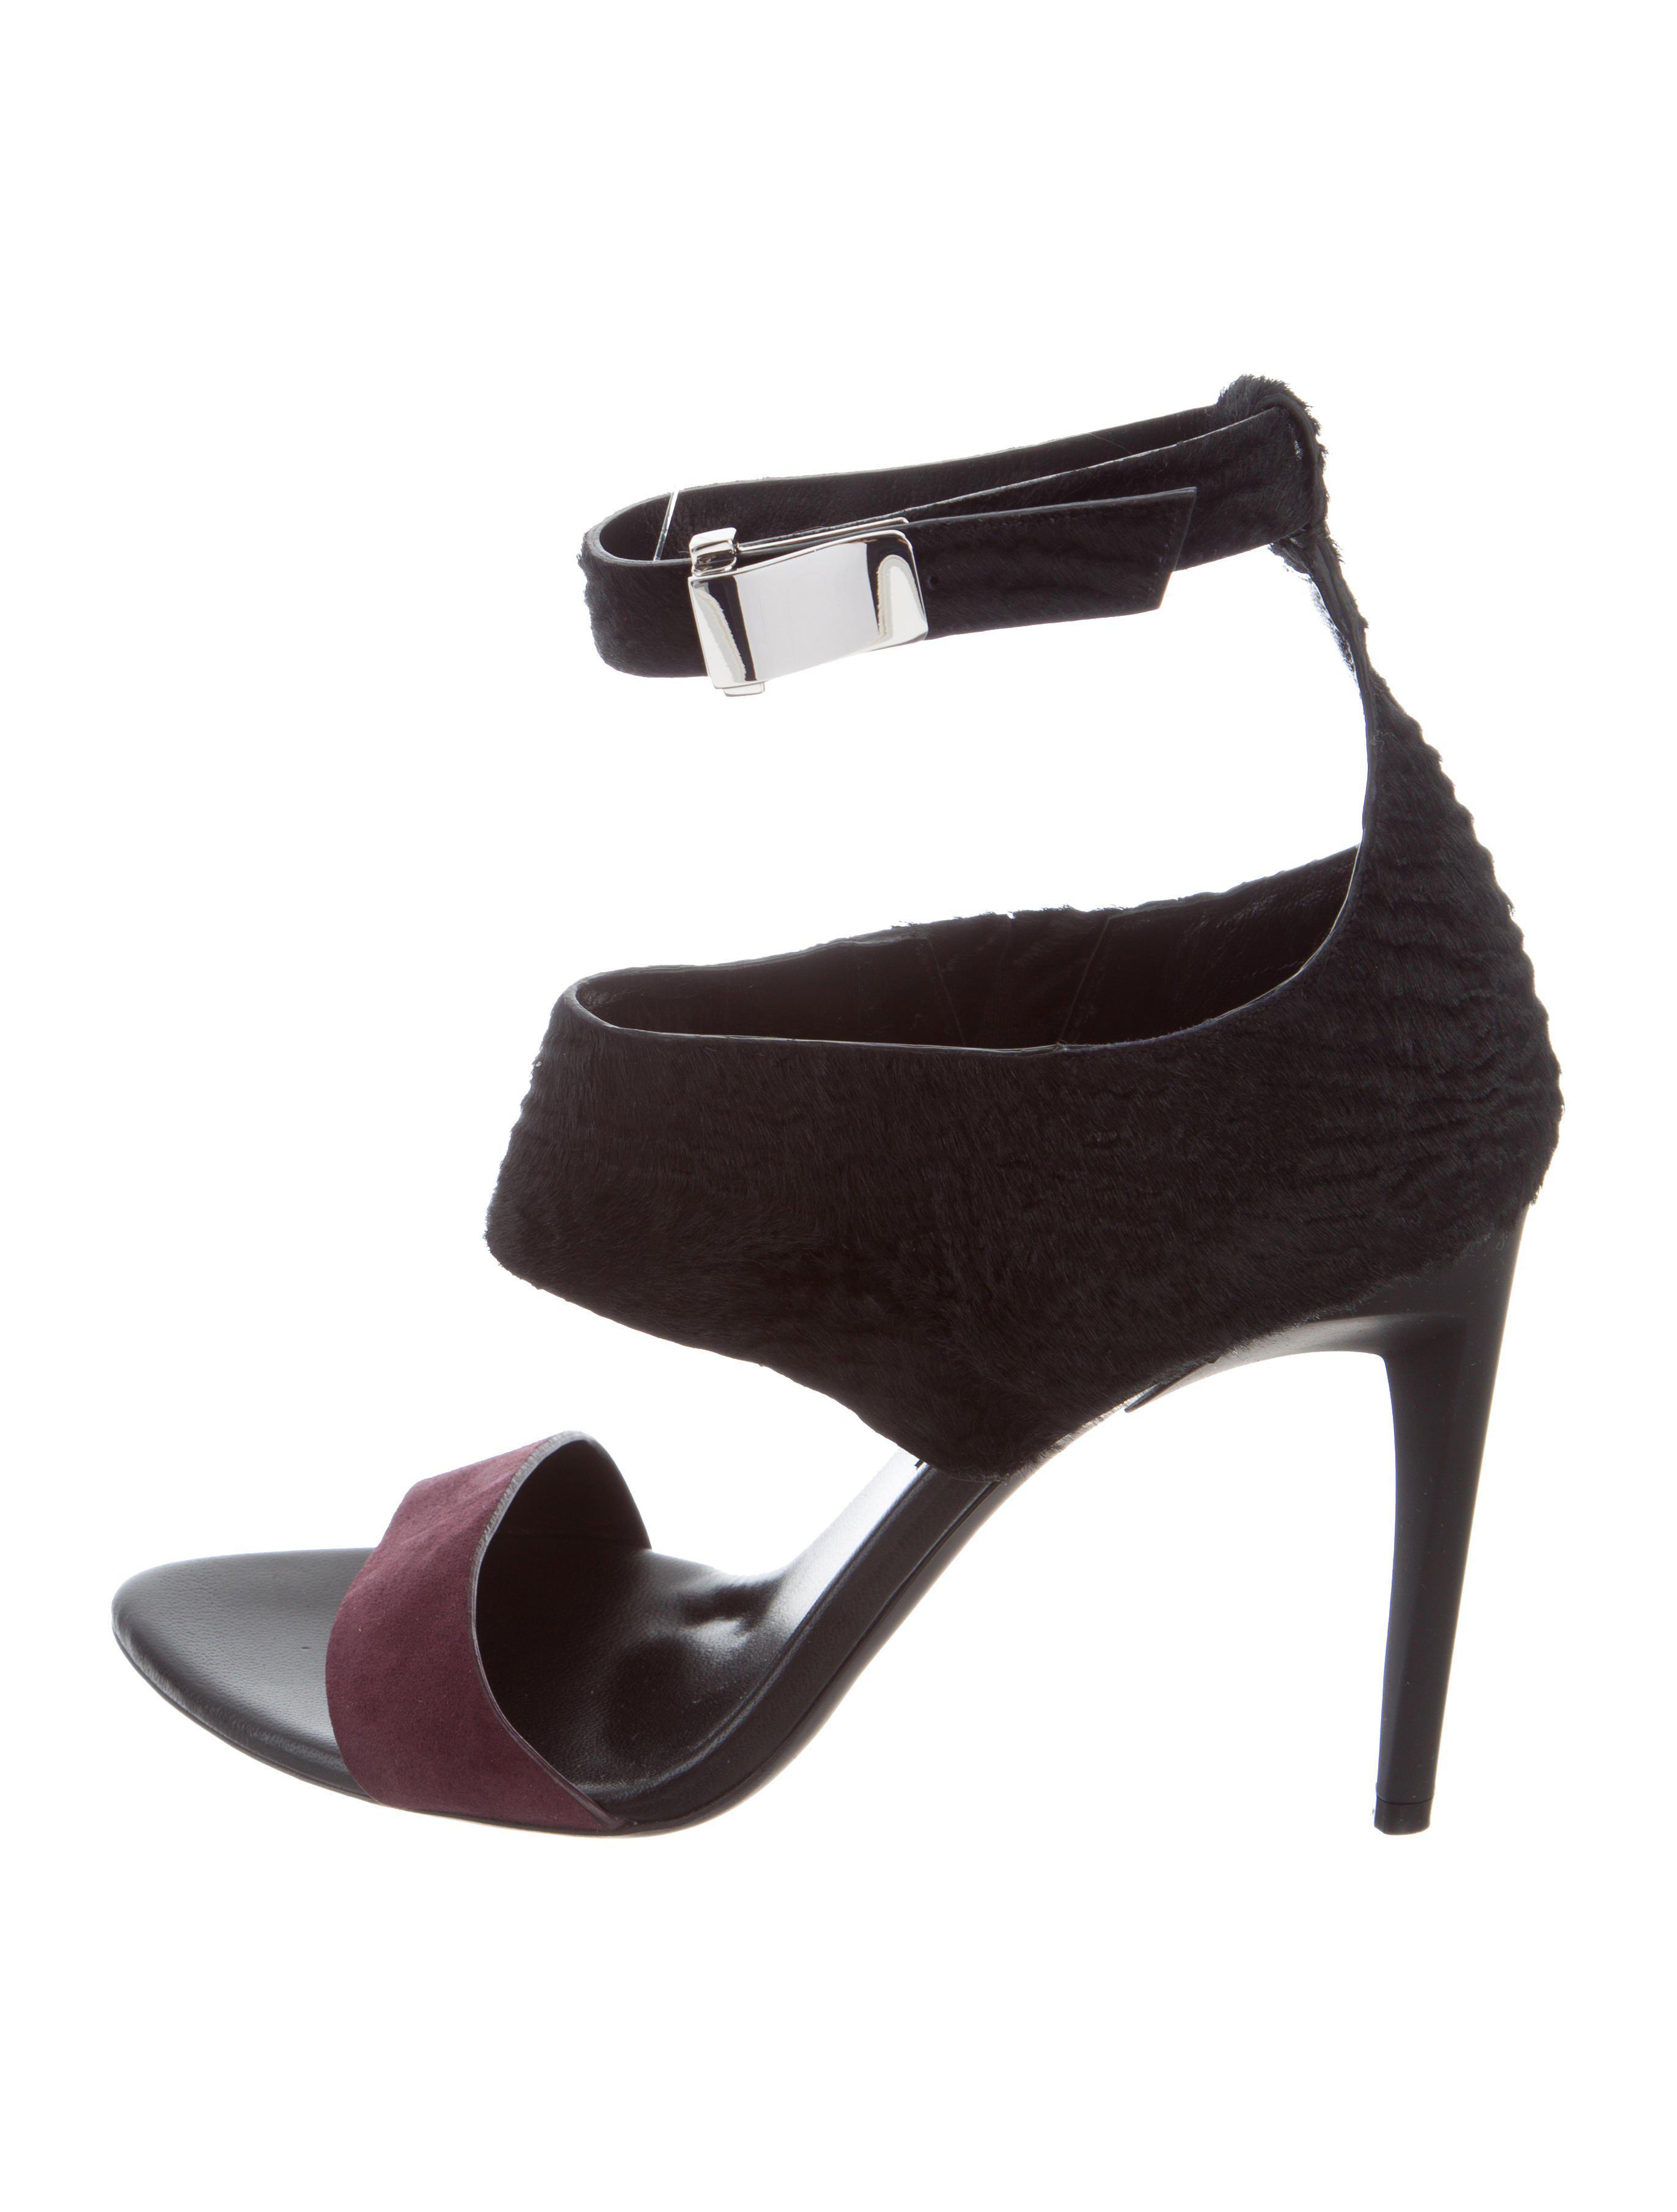 Proenza Schouler Zebra Ponyhair Sandals w/ Tags pick a best 2WxNDLG